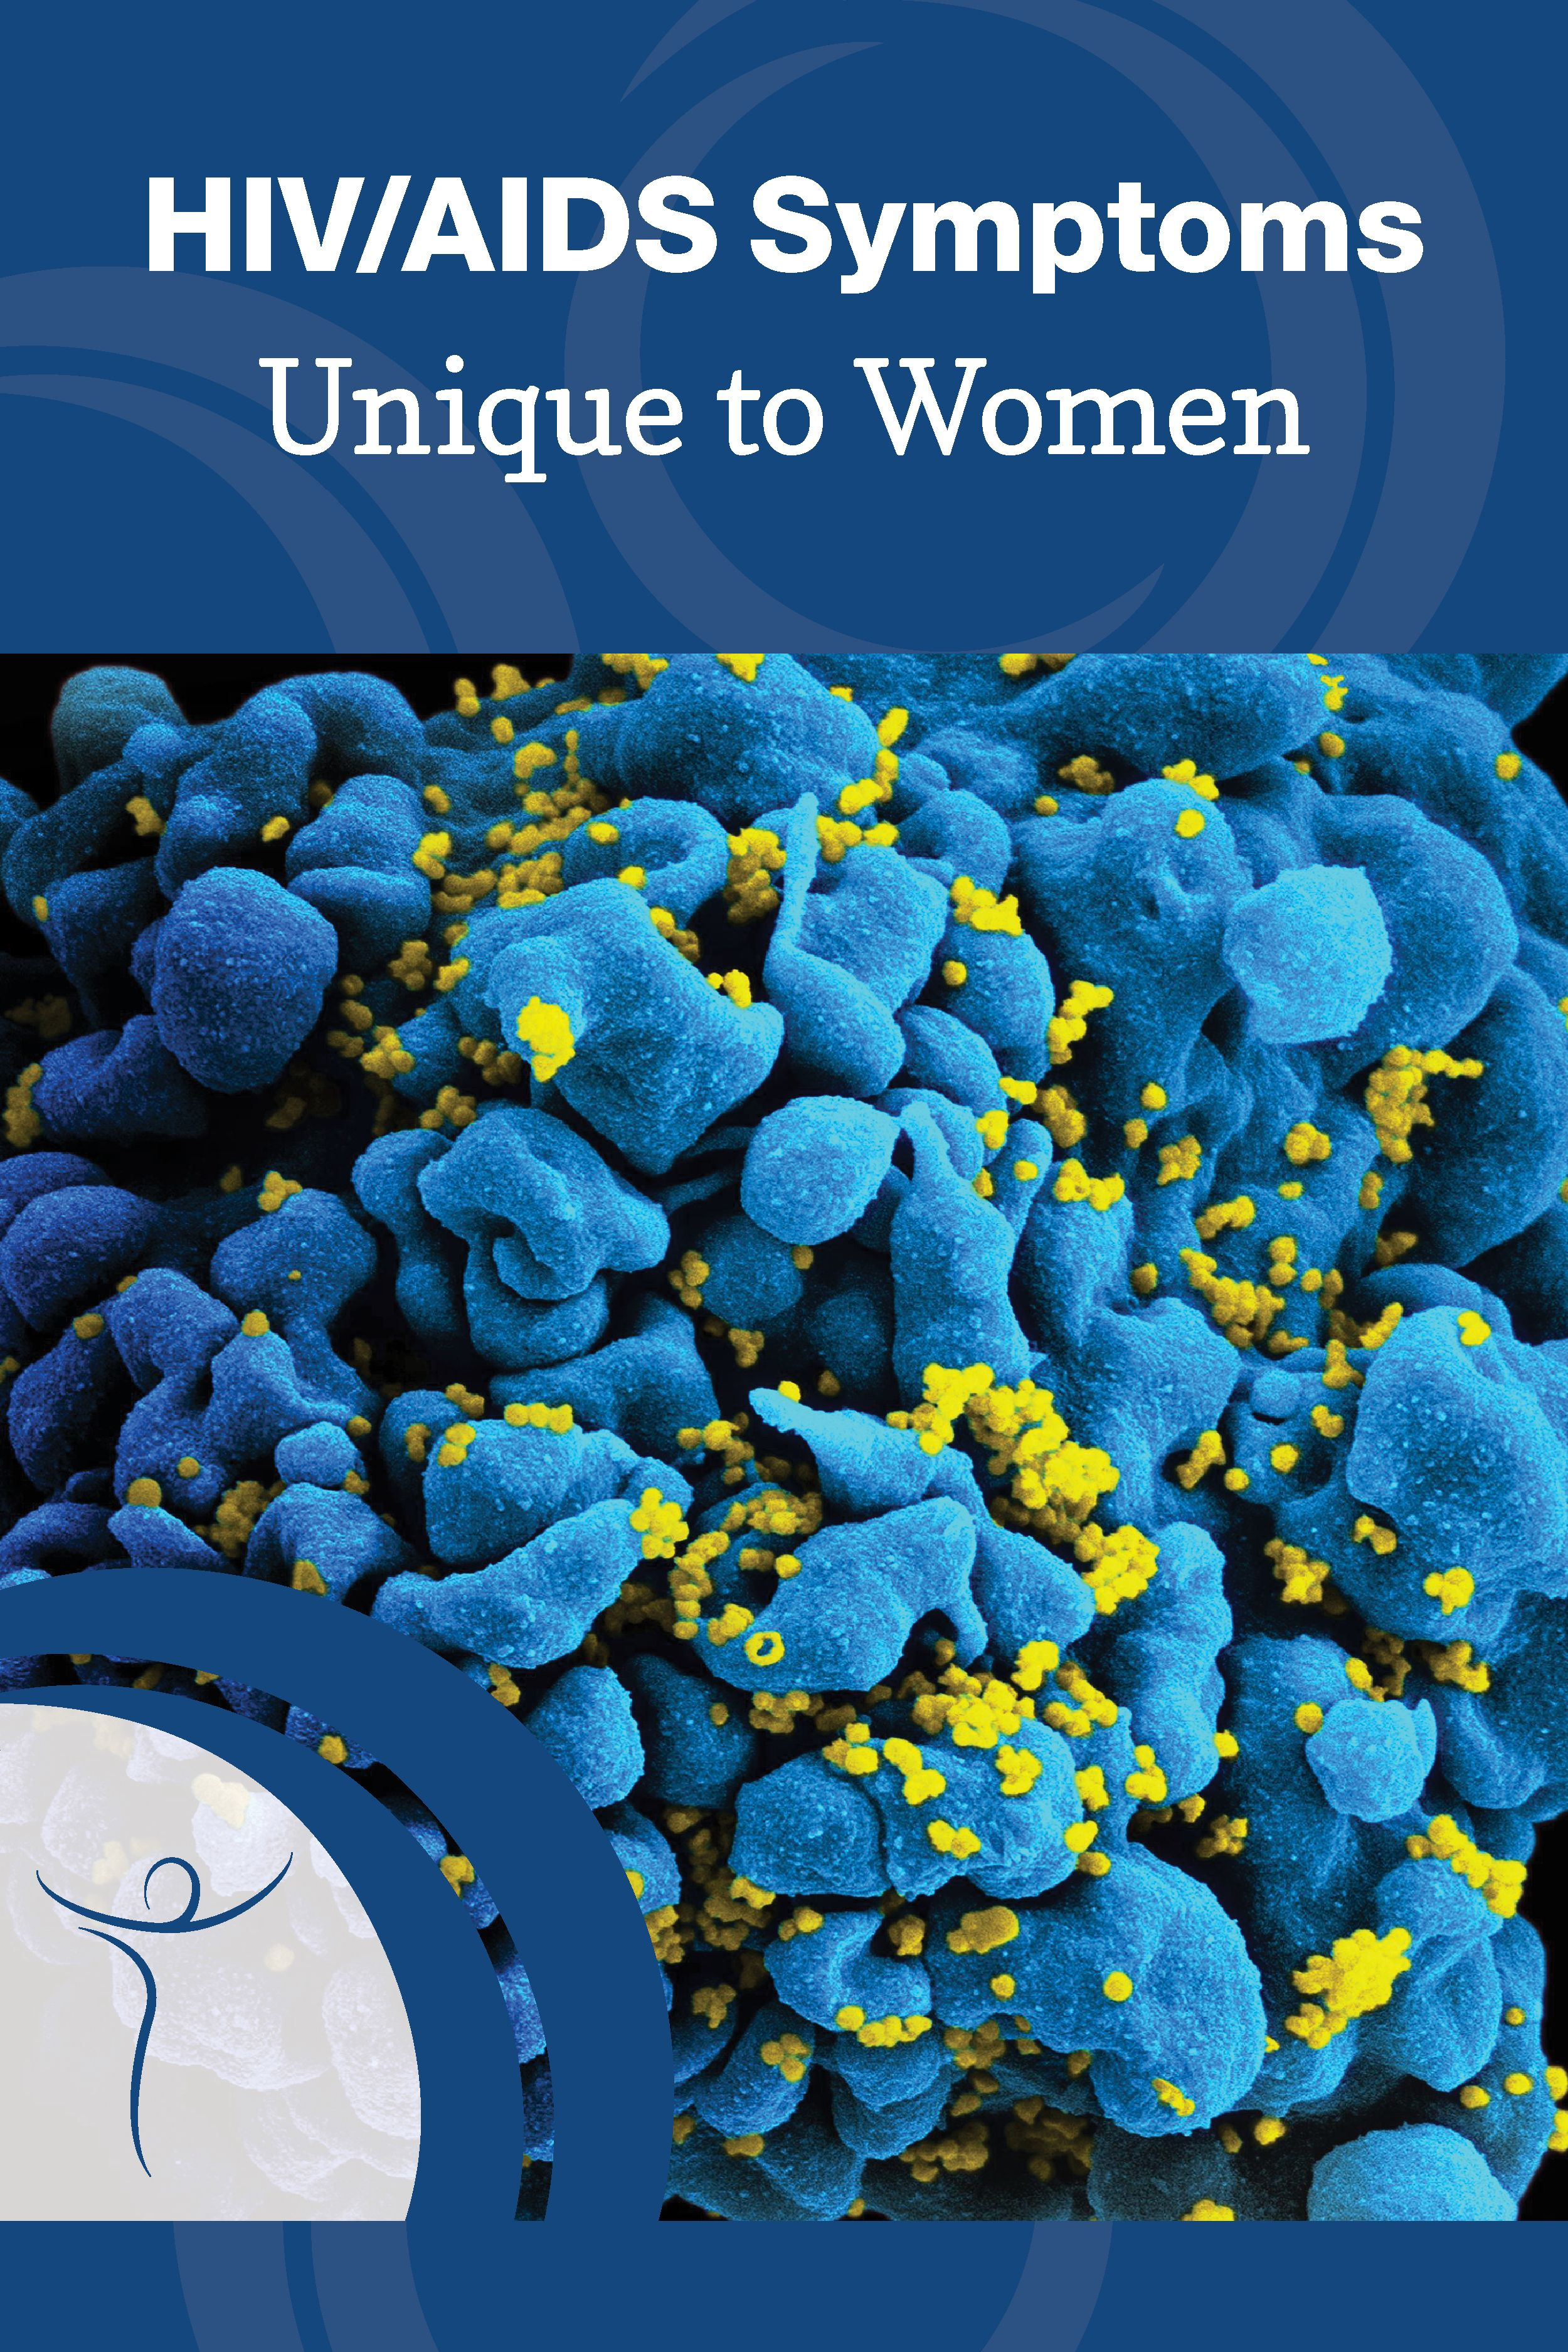 hpv causes hiv papilloma virus 52